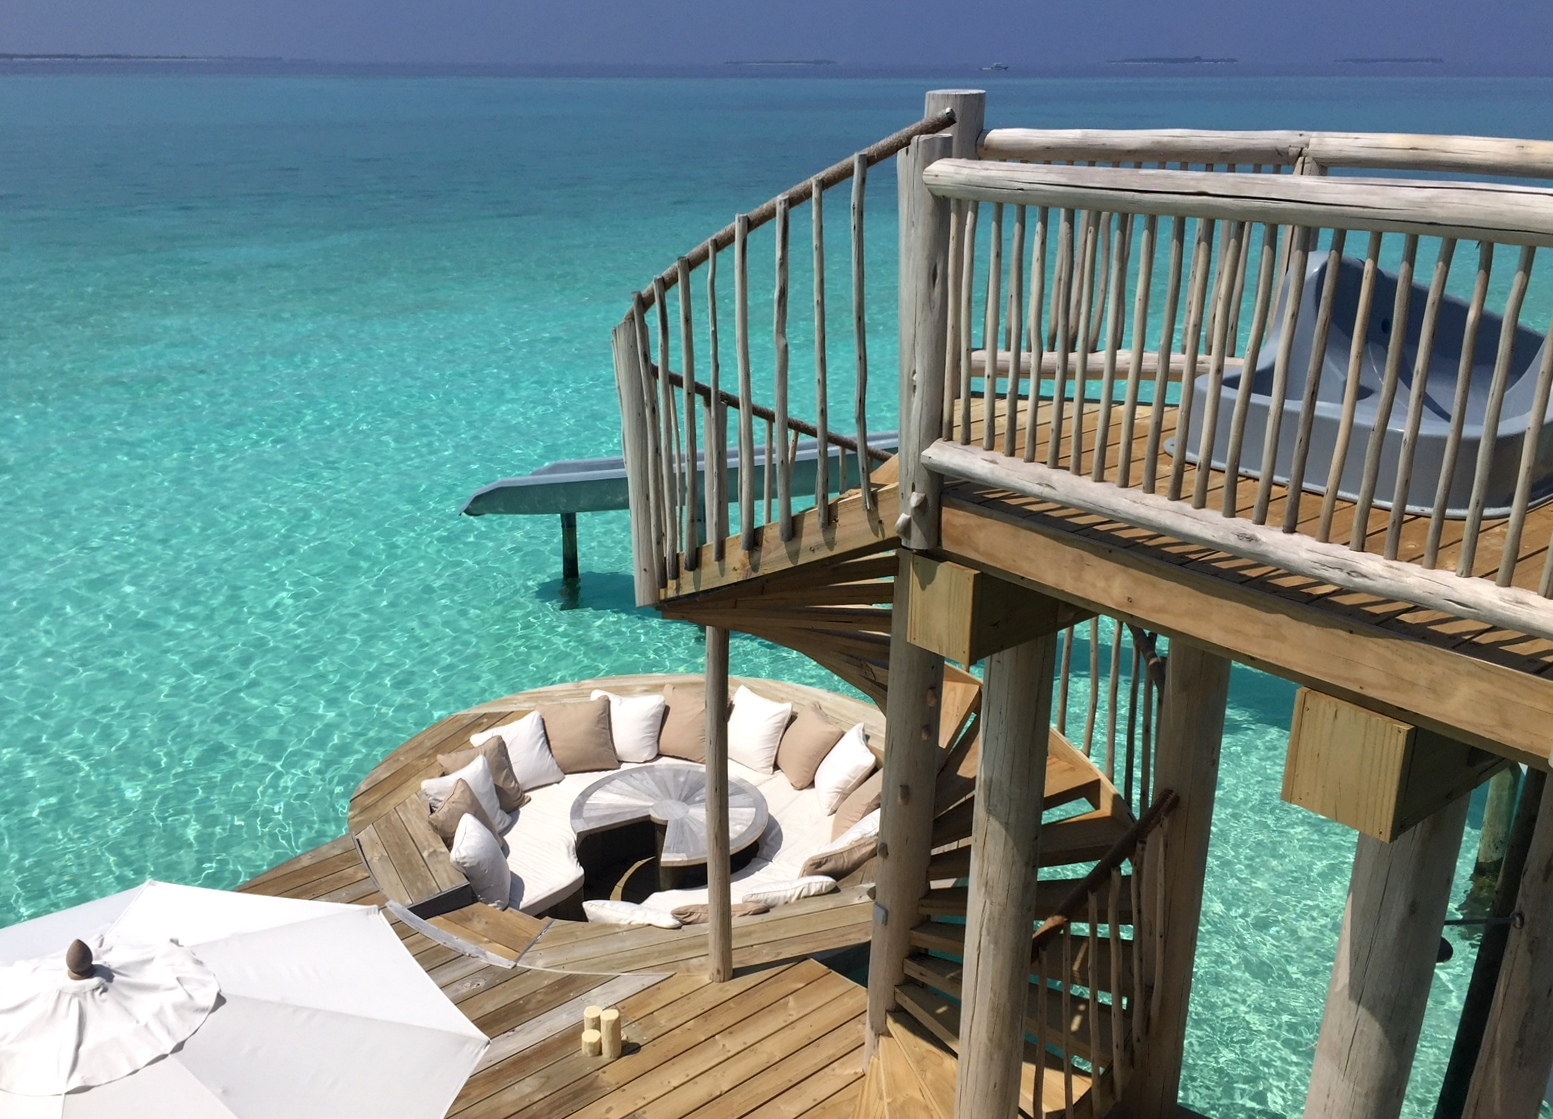 Zu Gast im neuen Soneva Jani Resort auf den Malediven strand sonne reisebericht new malediven honeymoon 2  TUI Berlin Reisebuero Malediven Soneva Jani Rutsche Wasservilla